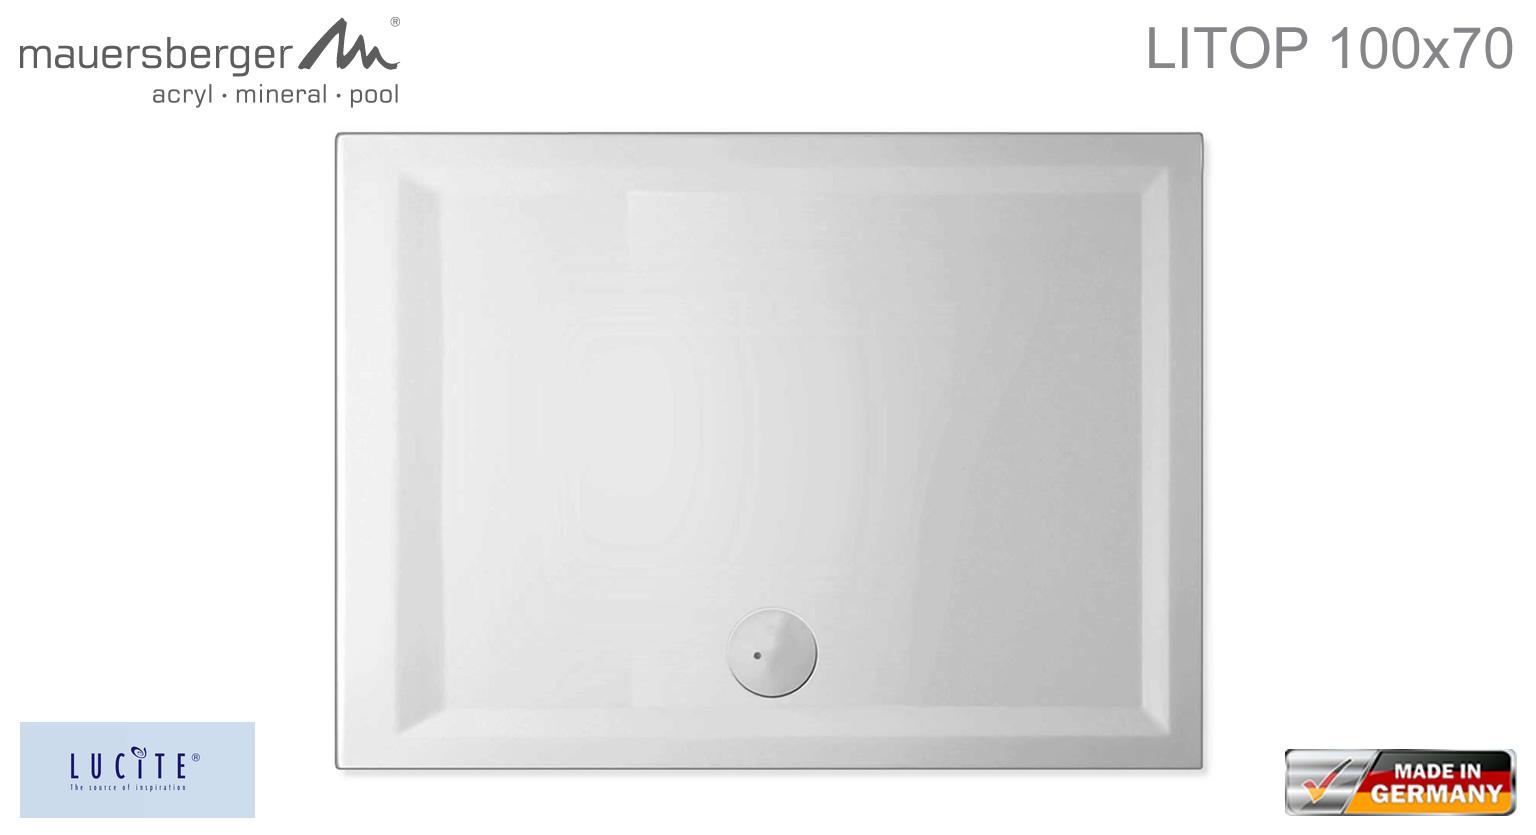 mauersberger duschwanne litop 100 x 70 cm superflach. Black Bedroom Furniture Sets. Home Design Ideas